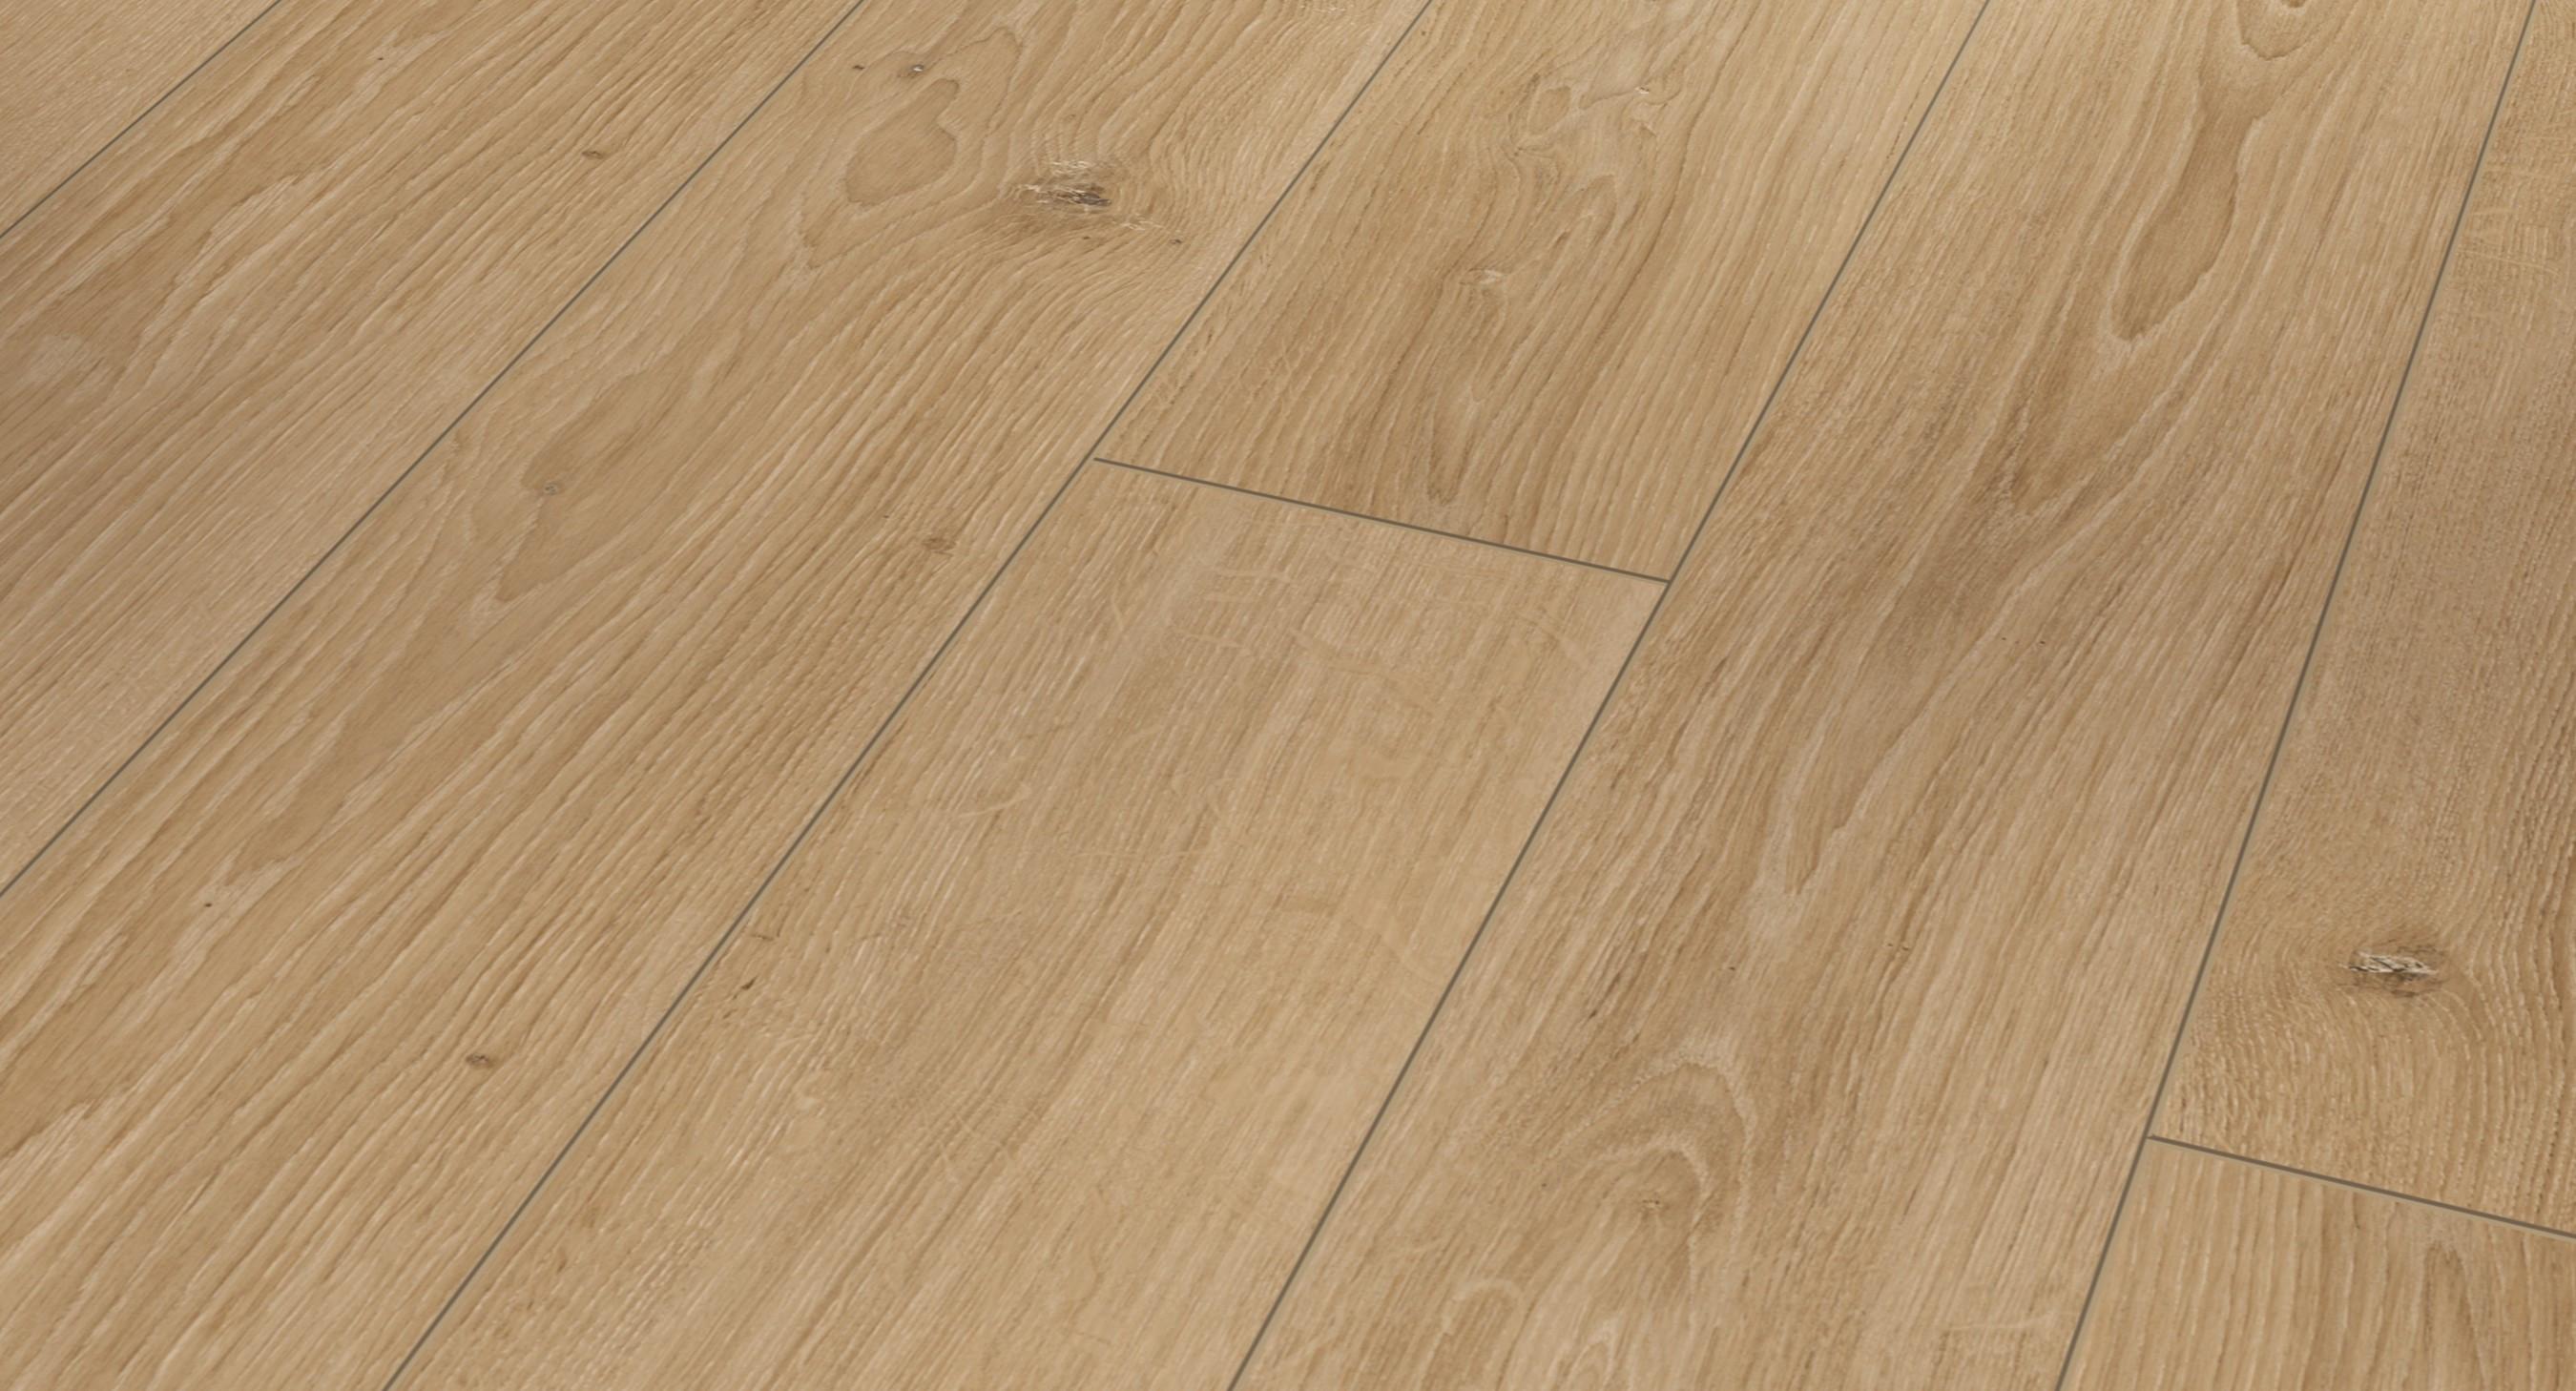 bruce hardwood laminate flooring of 25 beautiful laminate floor care flooring ideas part 6727 for laminate floor care lovely classic laminate flooring products of 25 beautiful laminate floor care